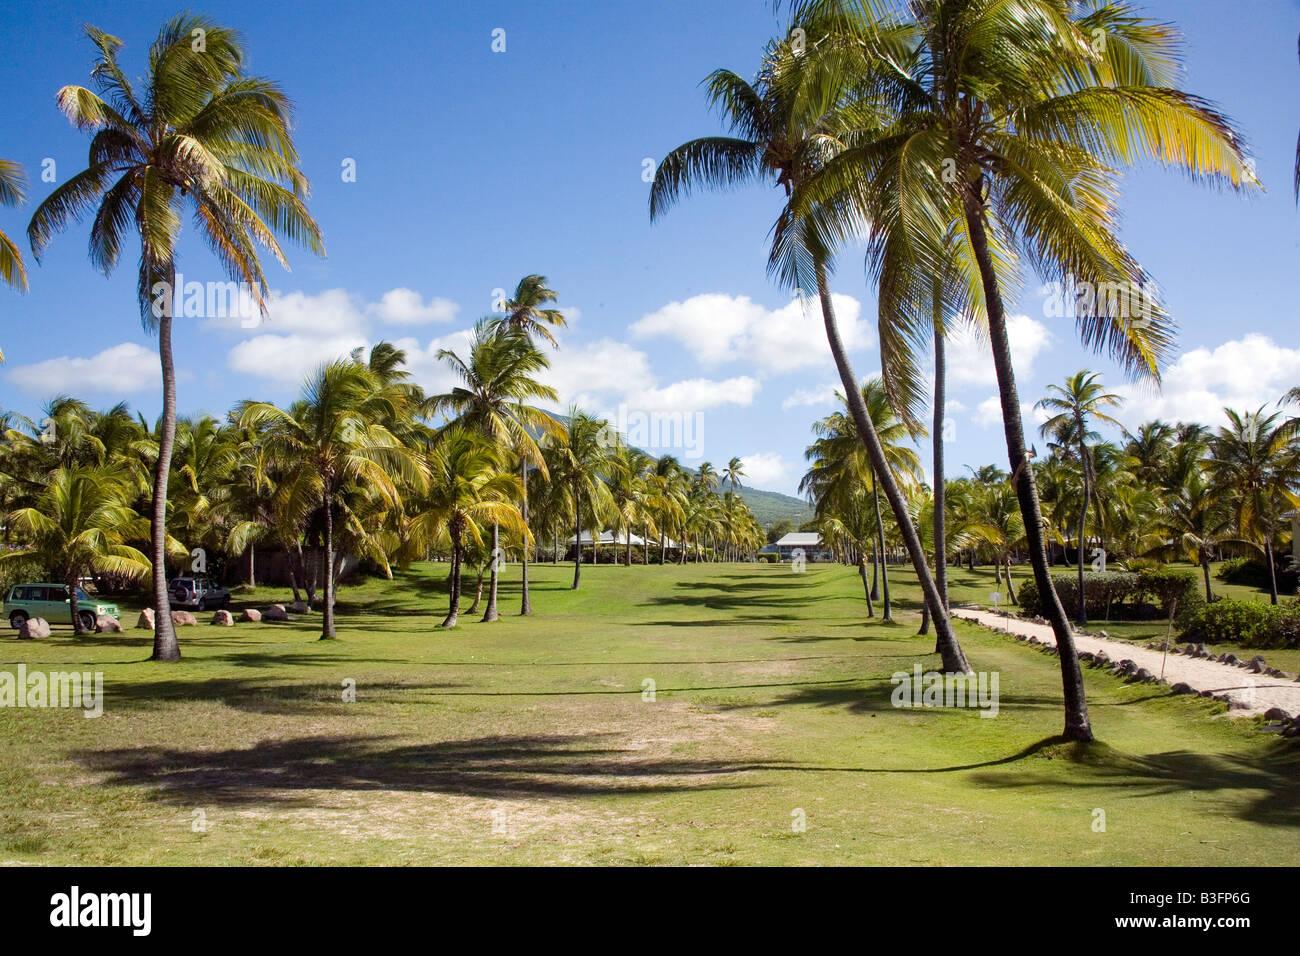 Nisbet Plantation Hotelgarten mit Kokospalmen am Nevis Karibik Stockbild